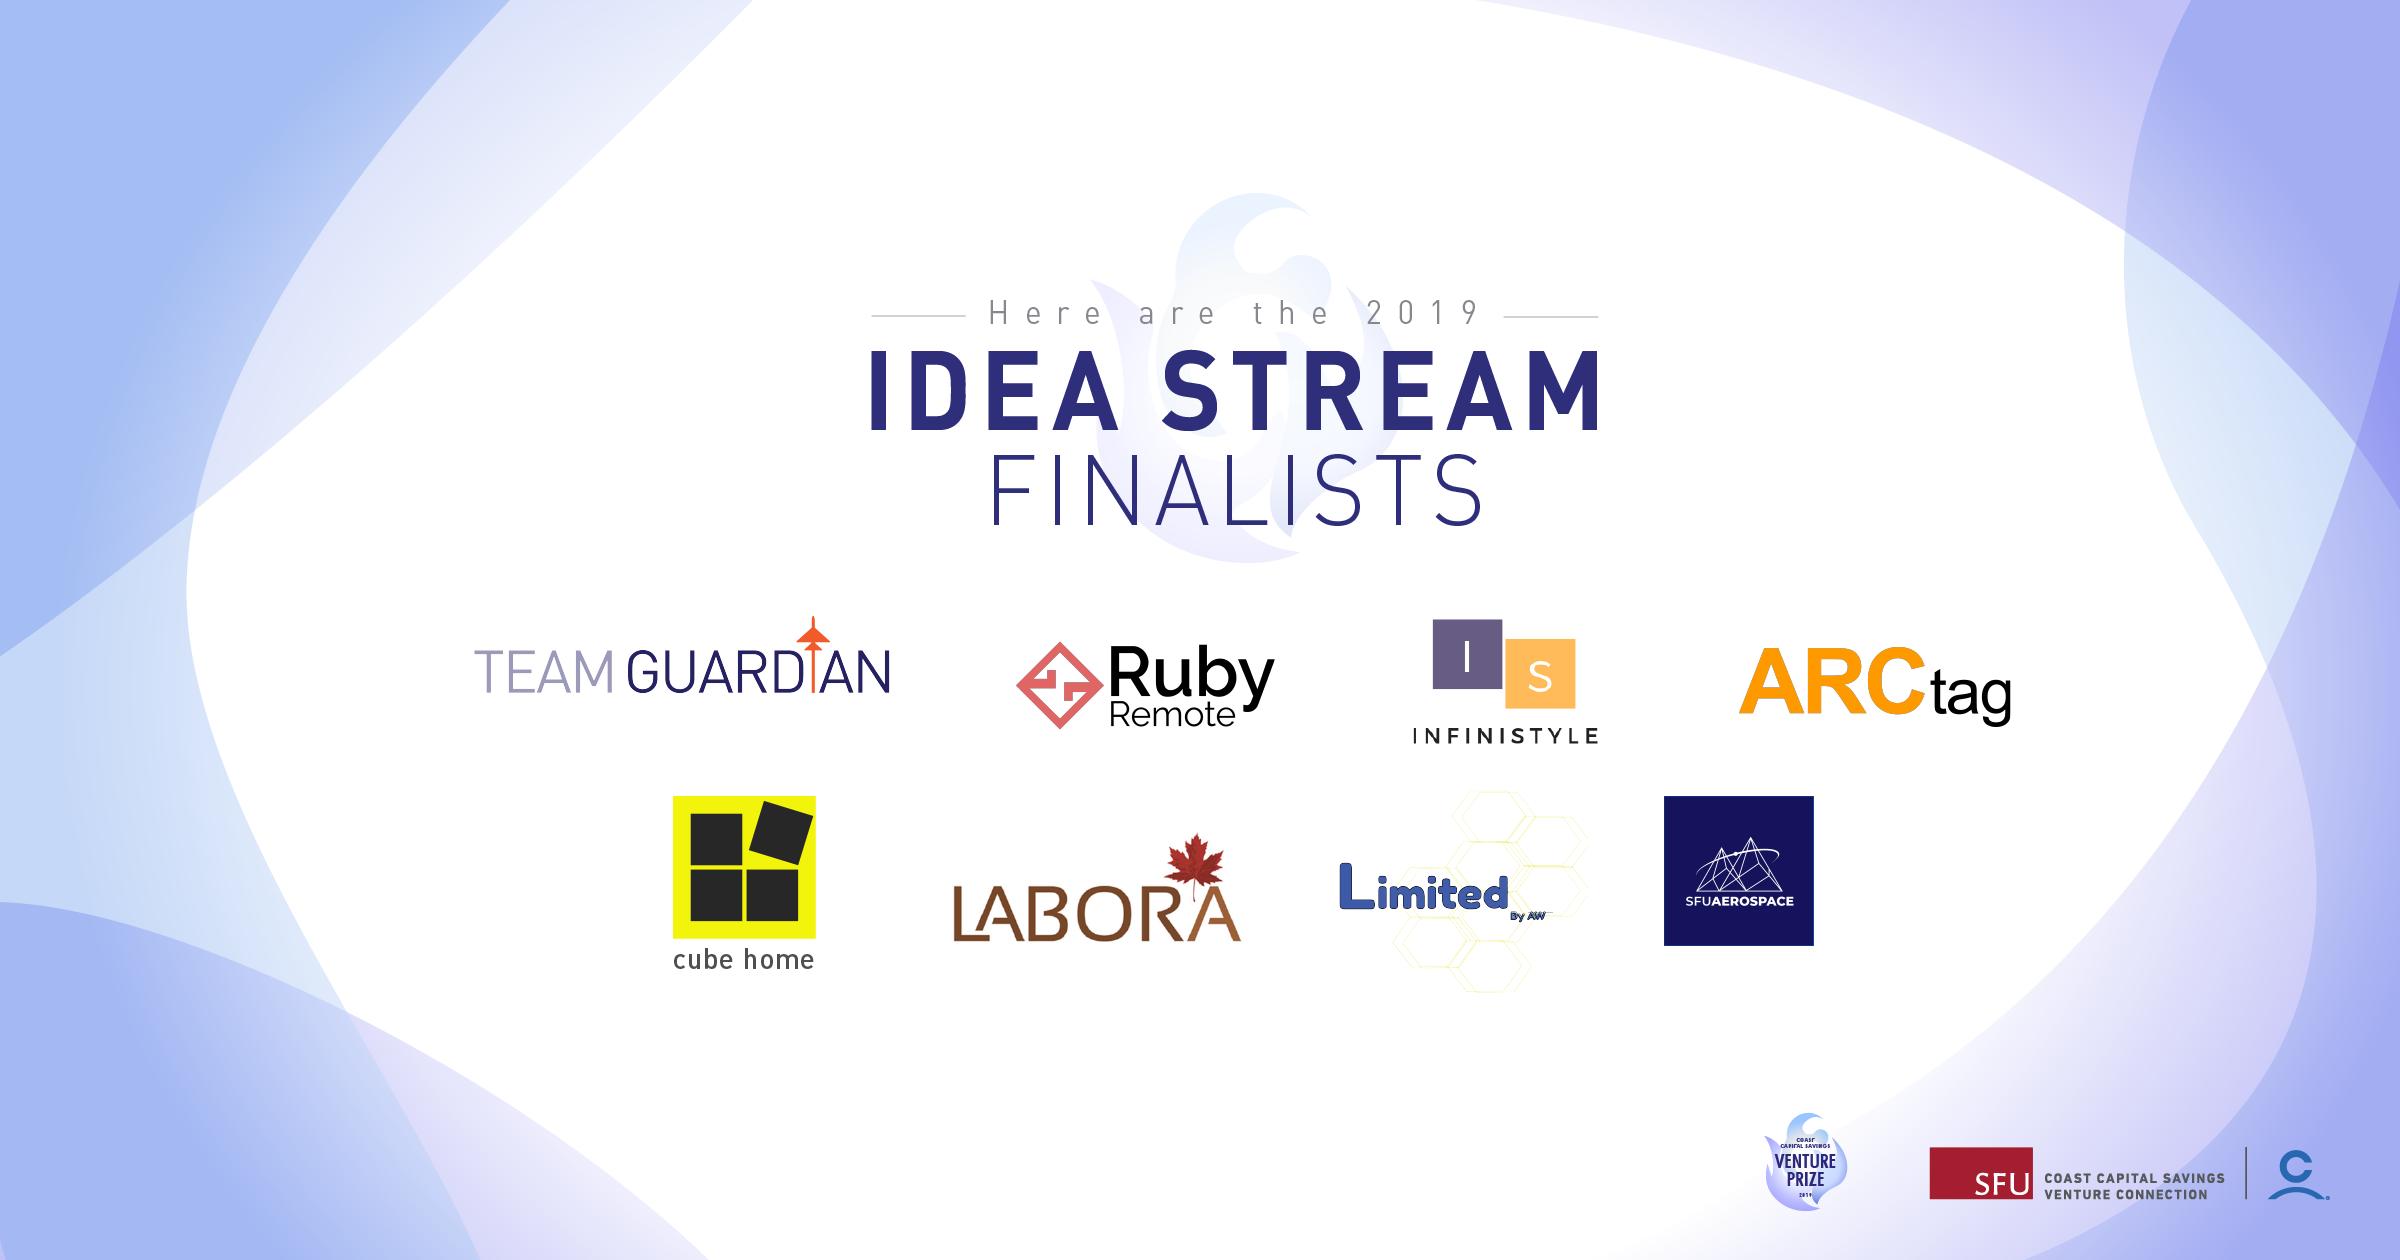 Idea Stream Finalists